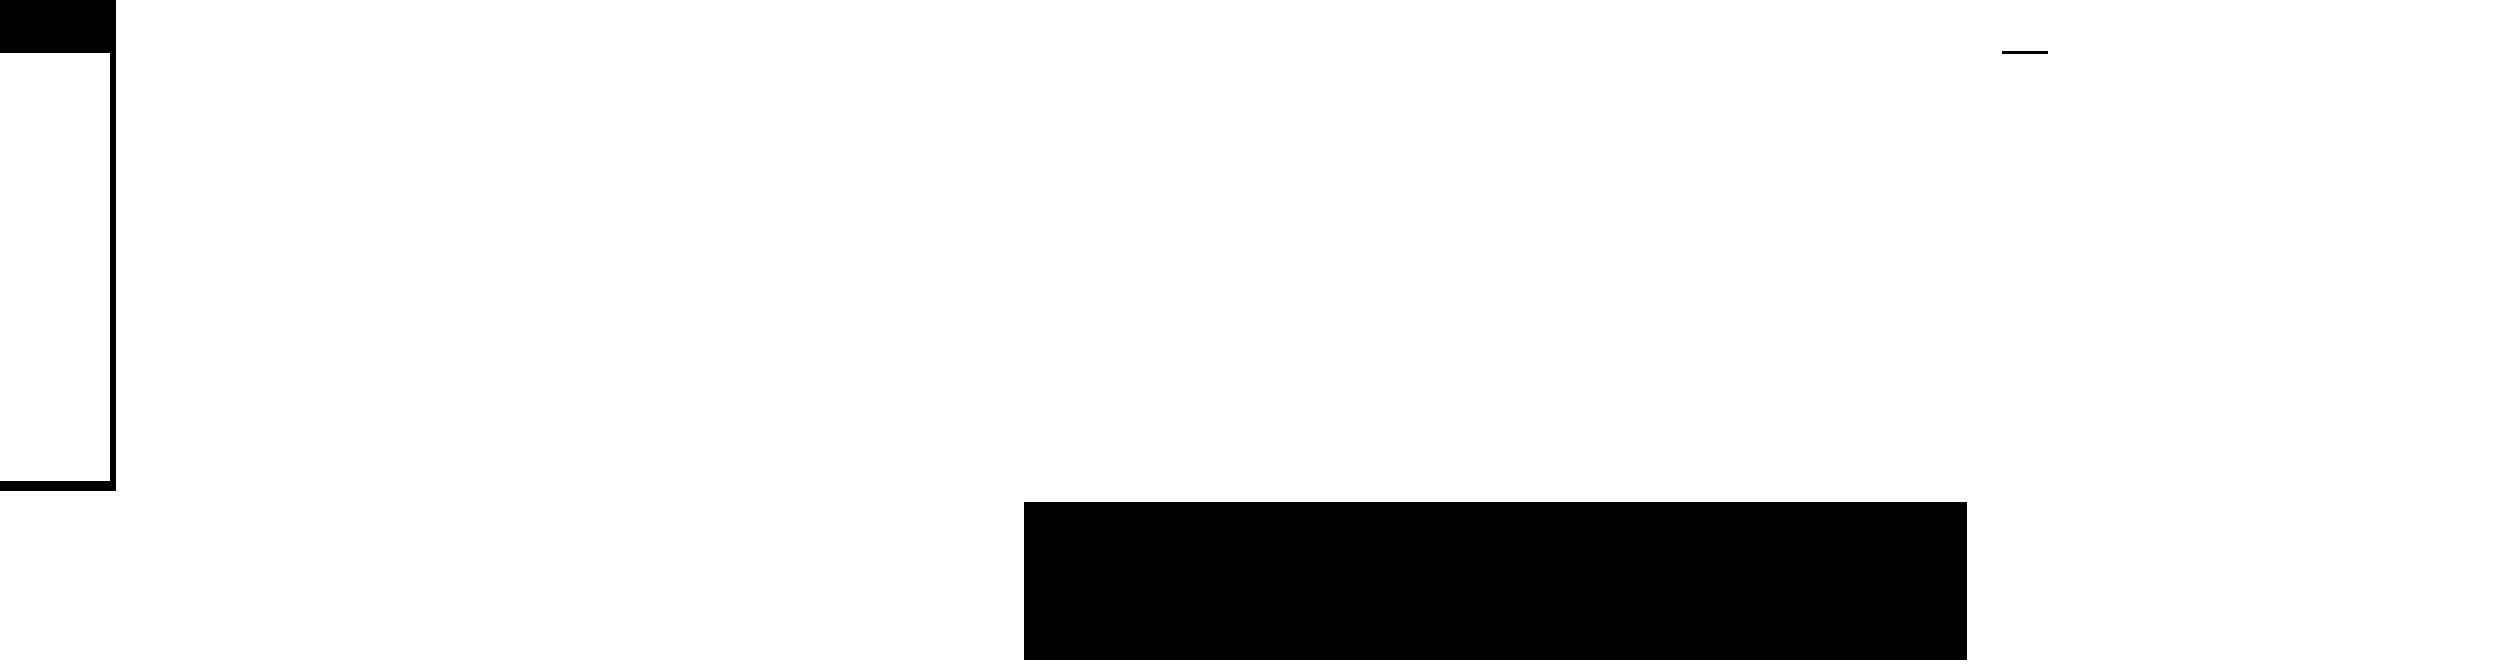 intonacija-logo-vector-samobijelo